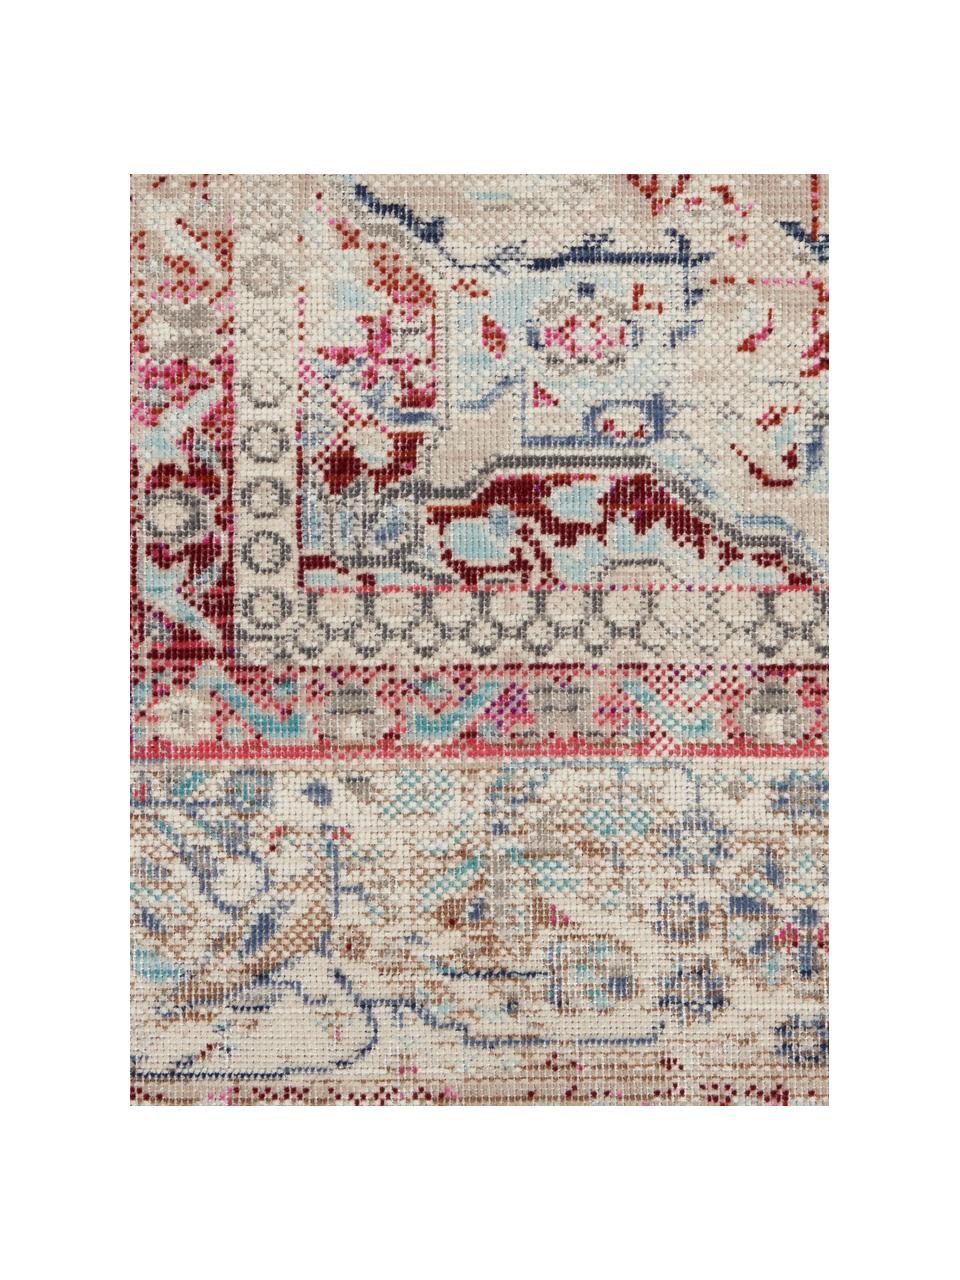 Vloerkleed Vintage Kashan met vintage patroon, Bovenzijde: 100% polypropyleen, Onderzijde: latex, Beige, rood, blauw, B 240 x L 300 cm (maat L)